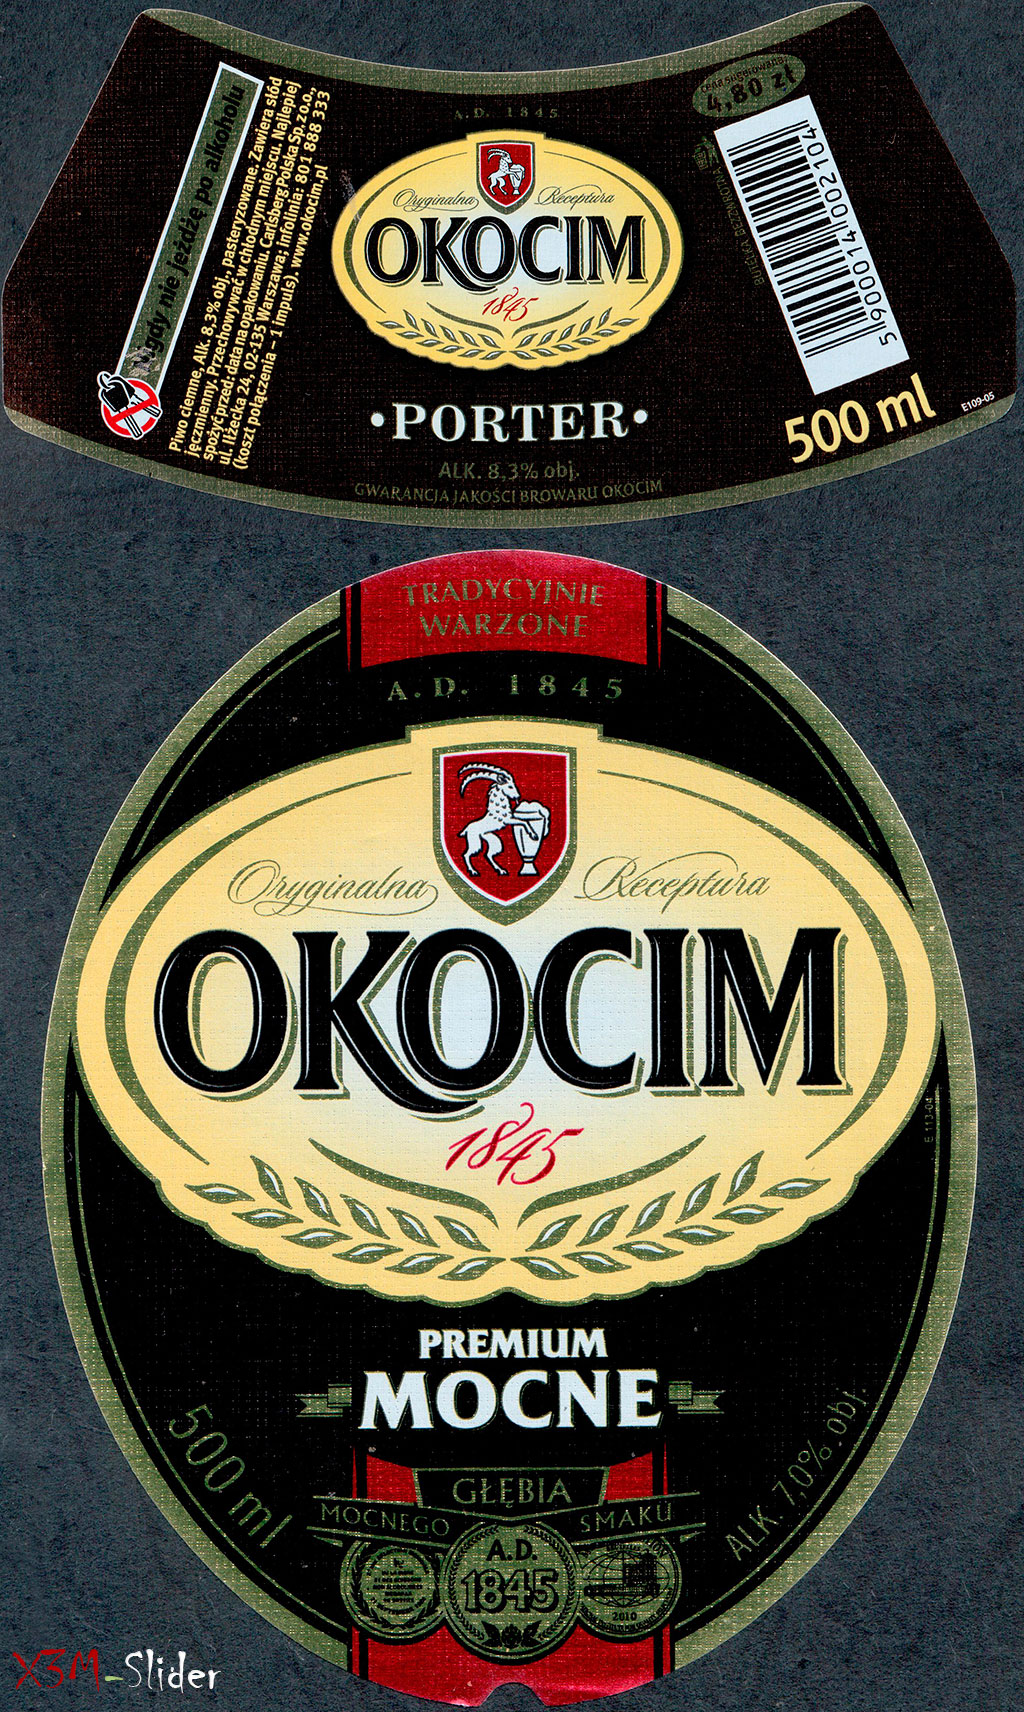 Okocim - Mocne Premium